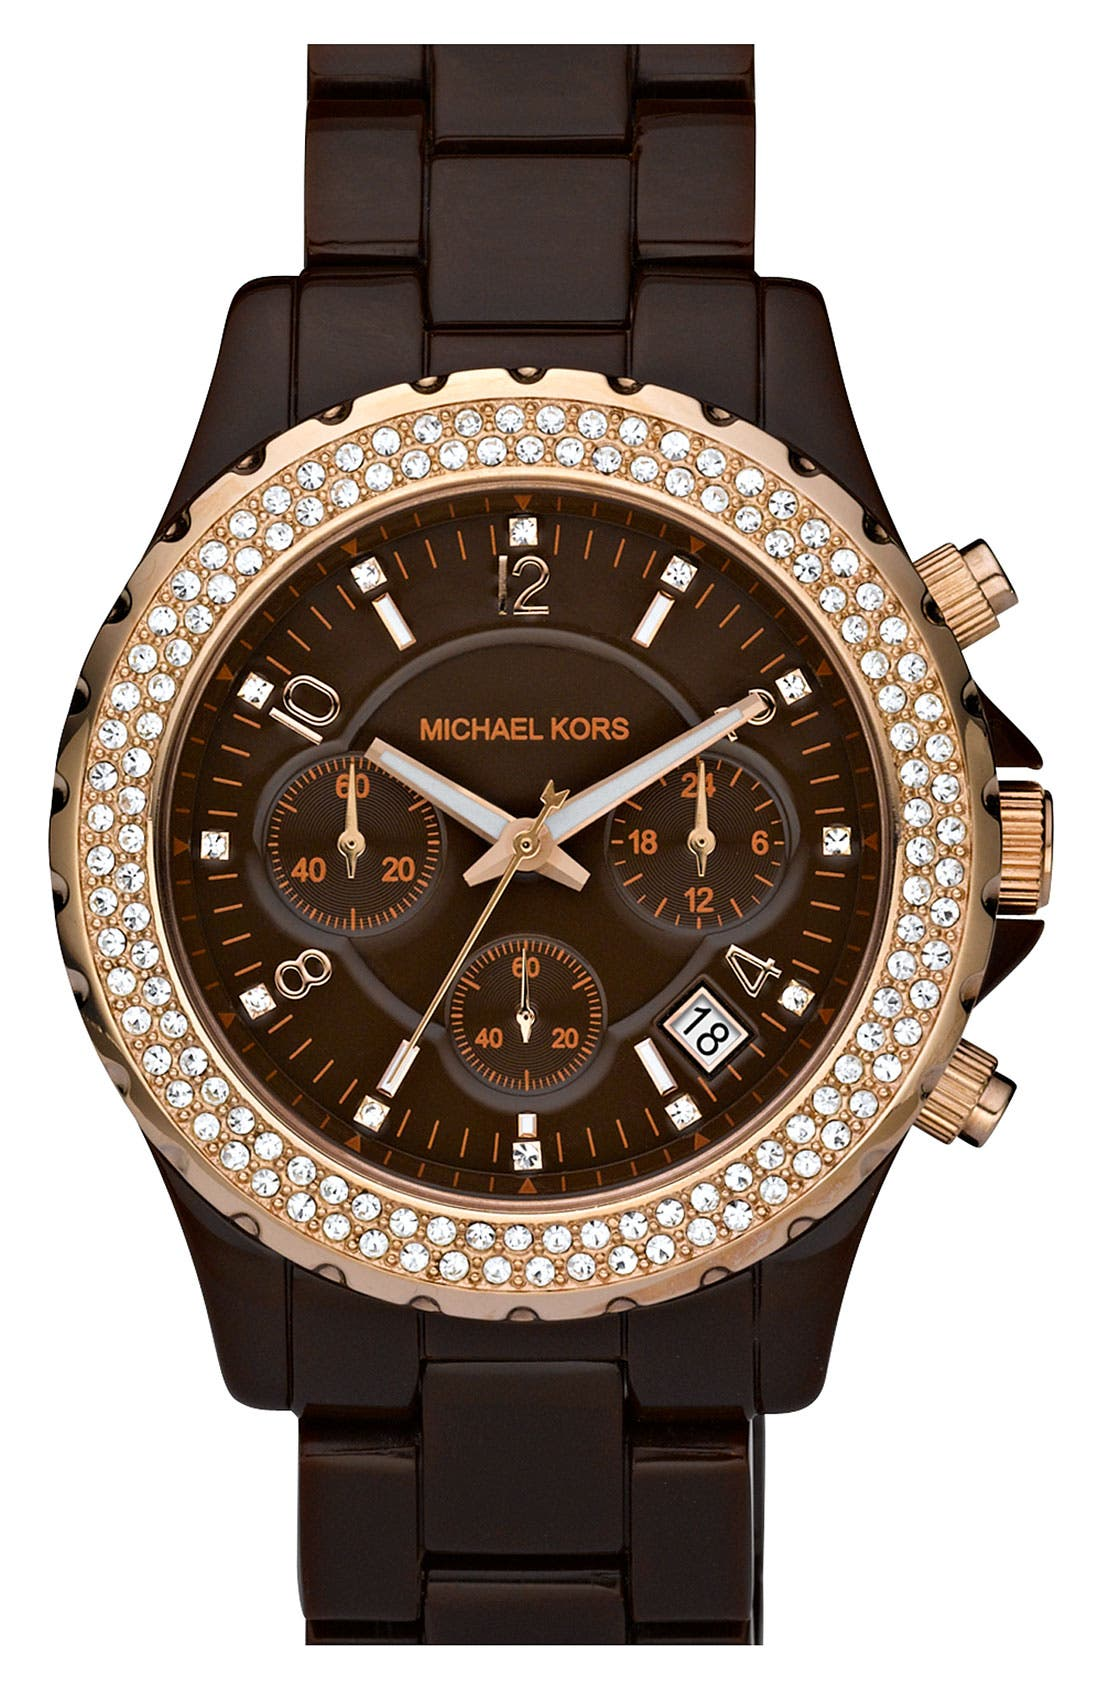 Main Image - Michael Kors 'Madison' Resin & Crystal Watch